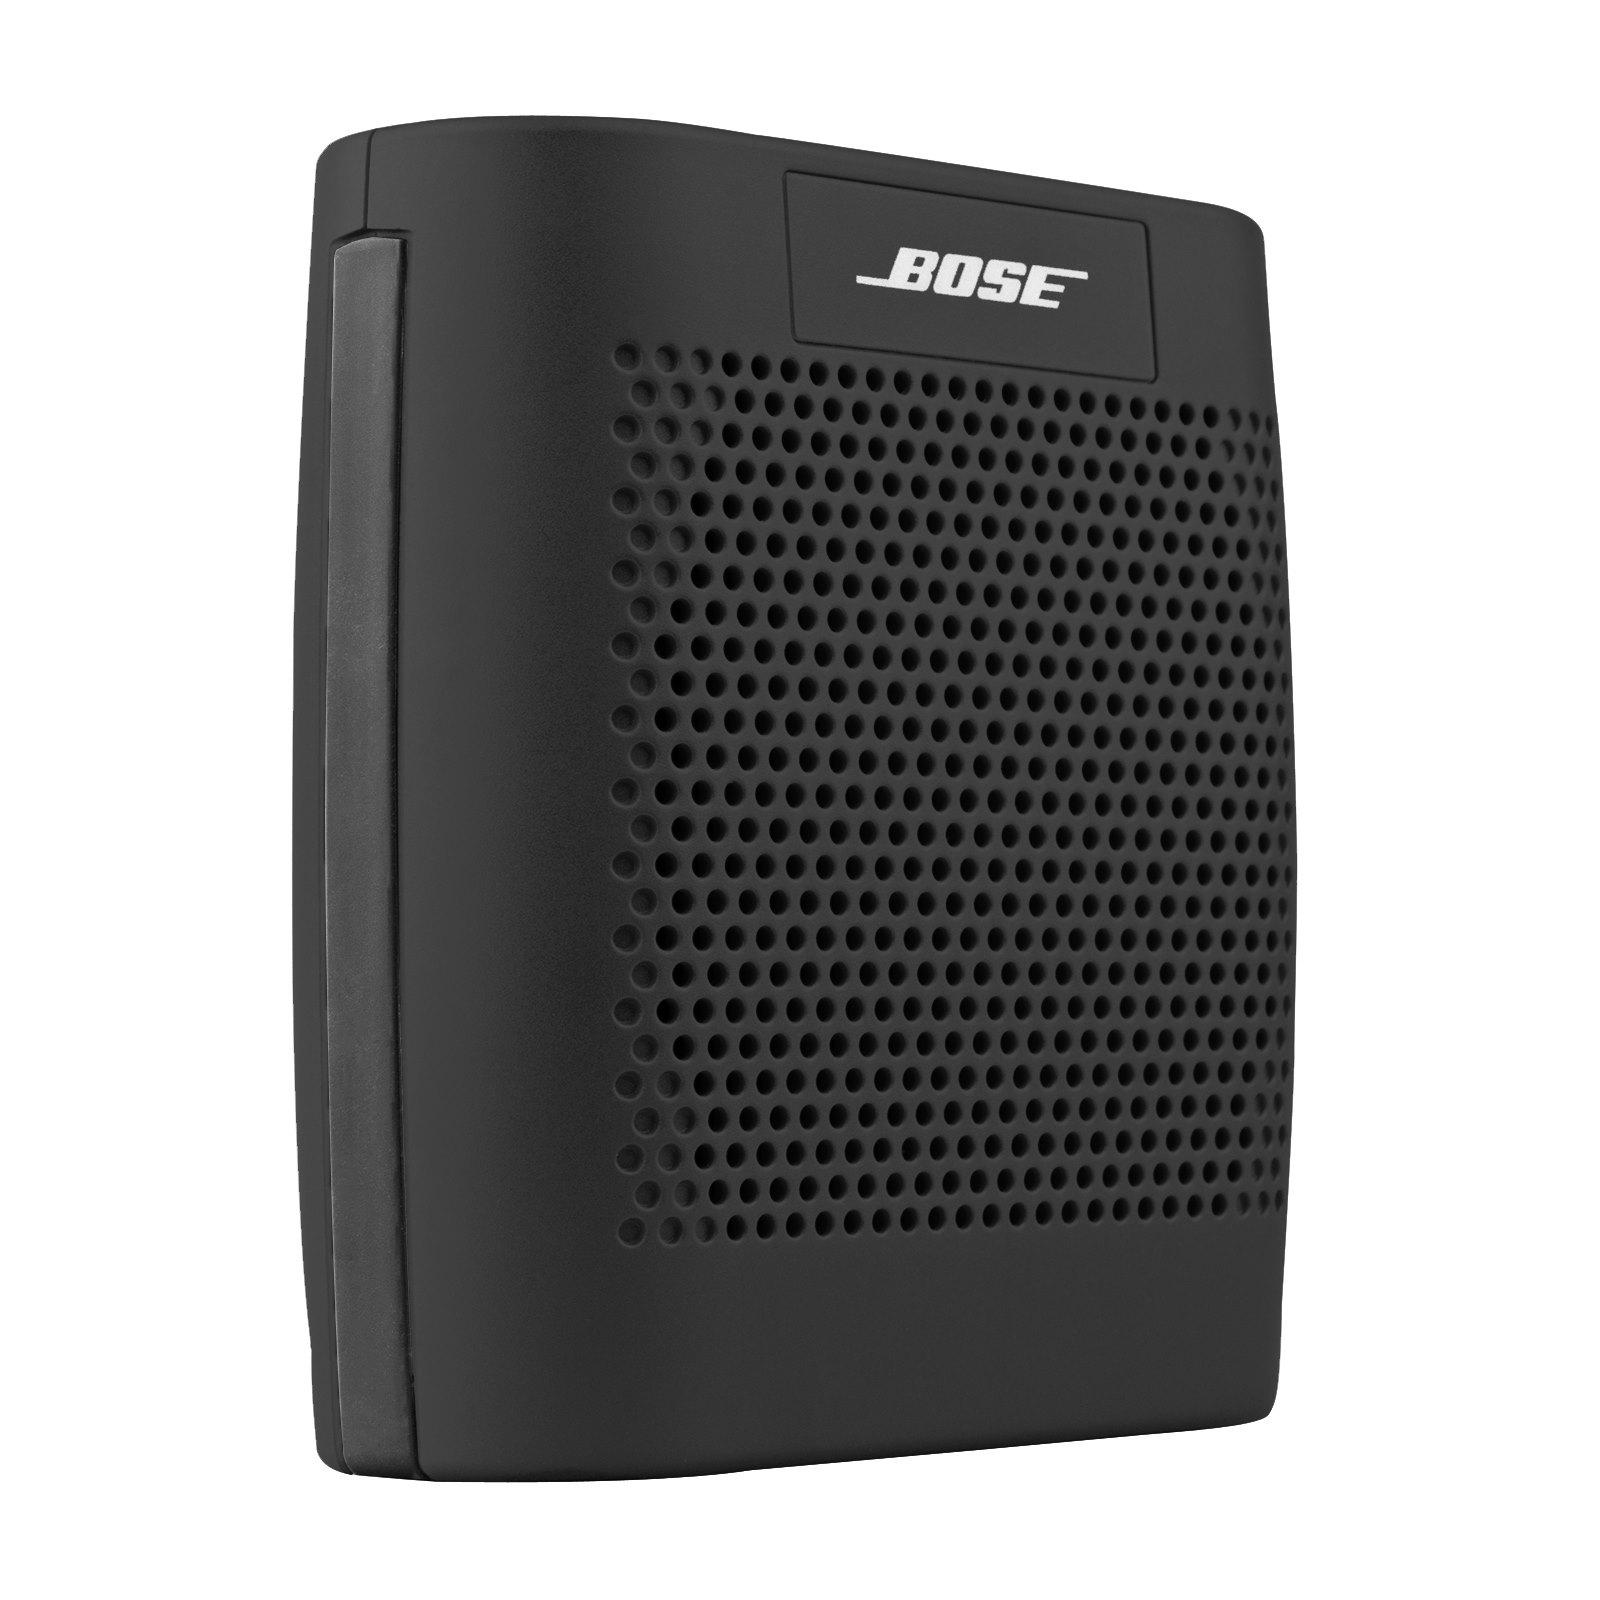 Bose SoundLink Color Ultra Portable Wireless Bluetooth Speaker